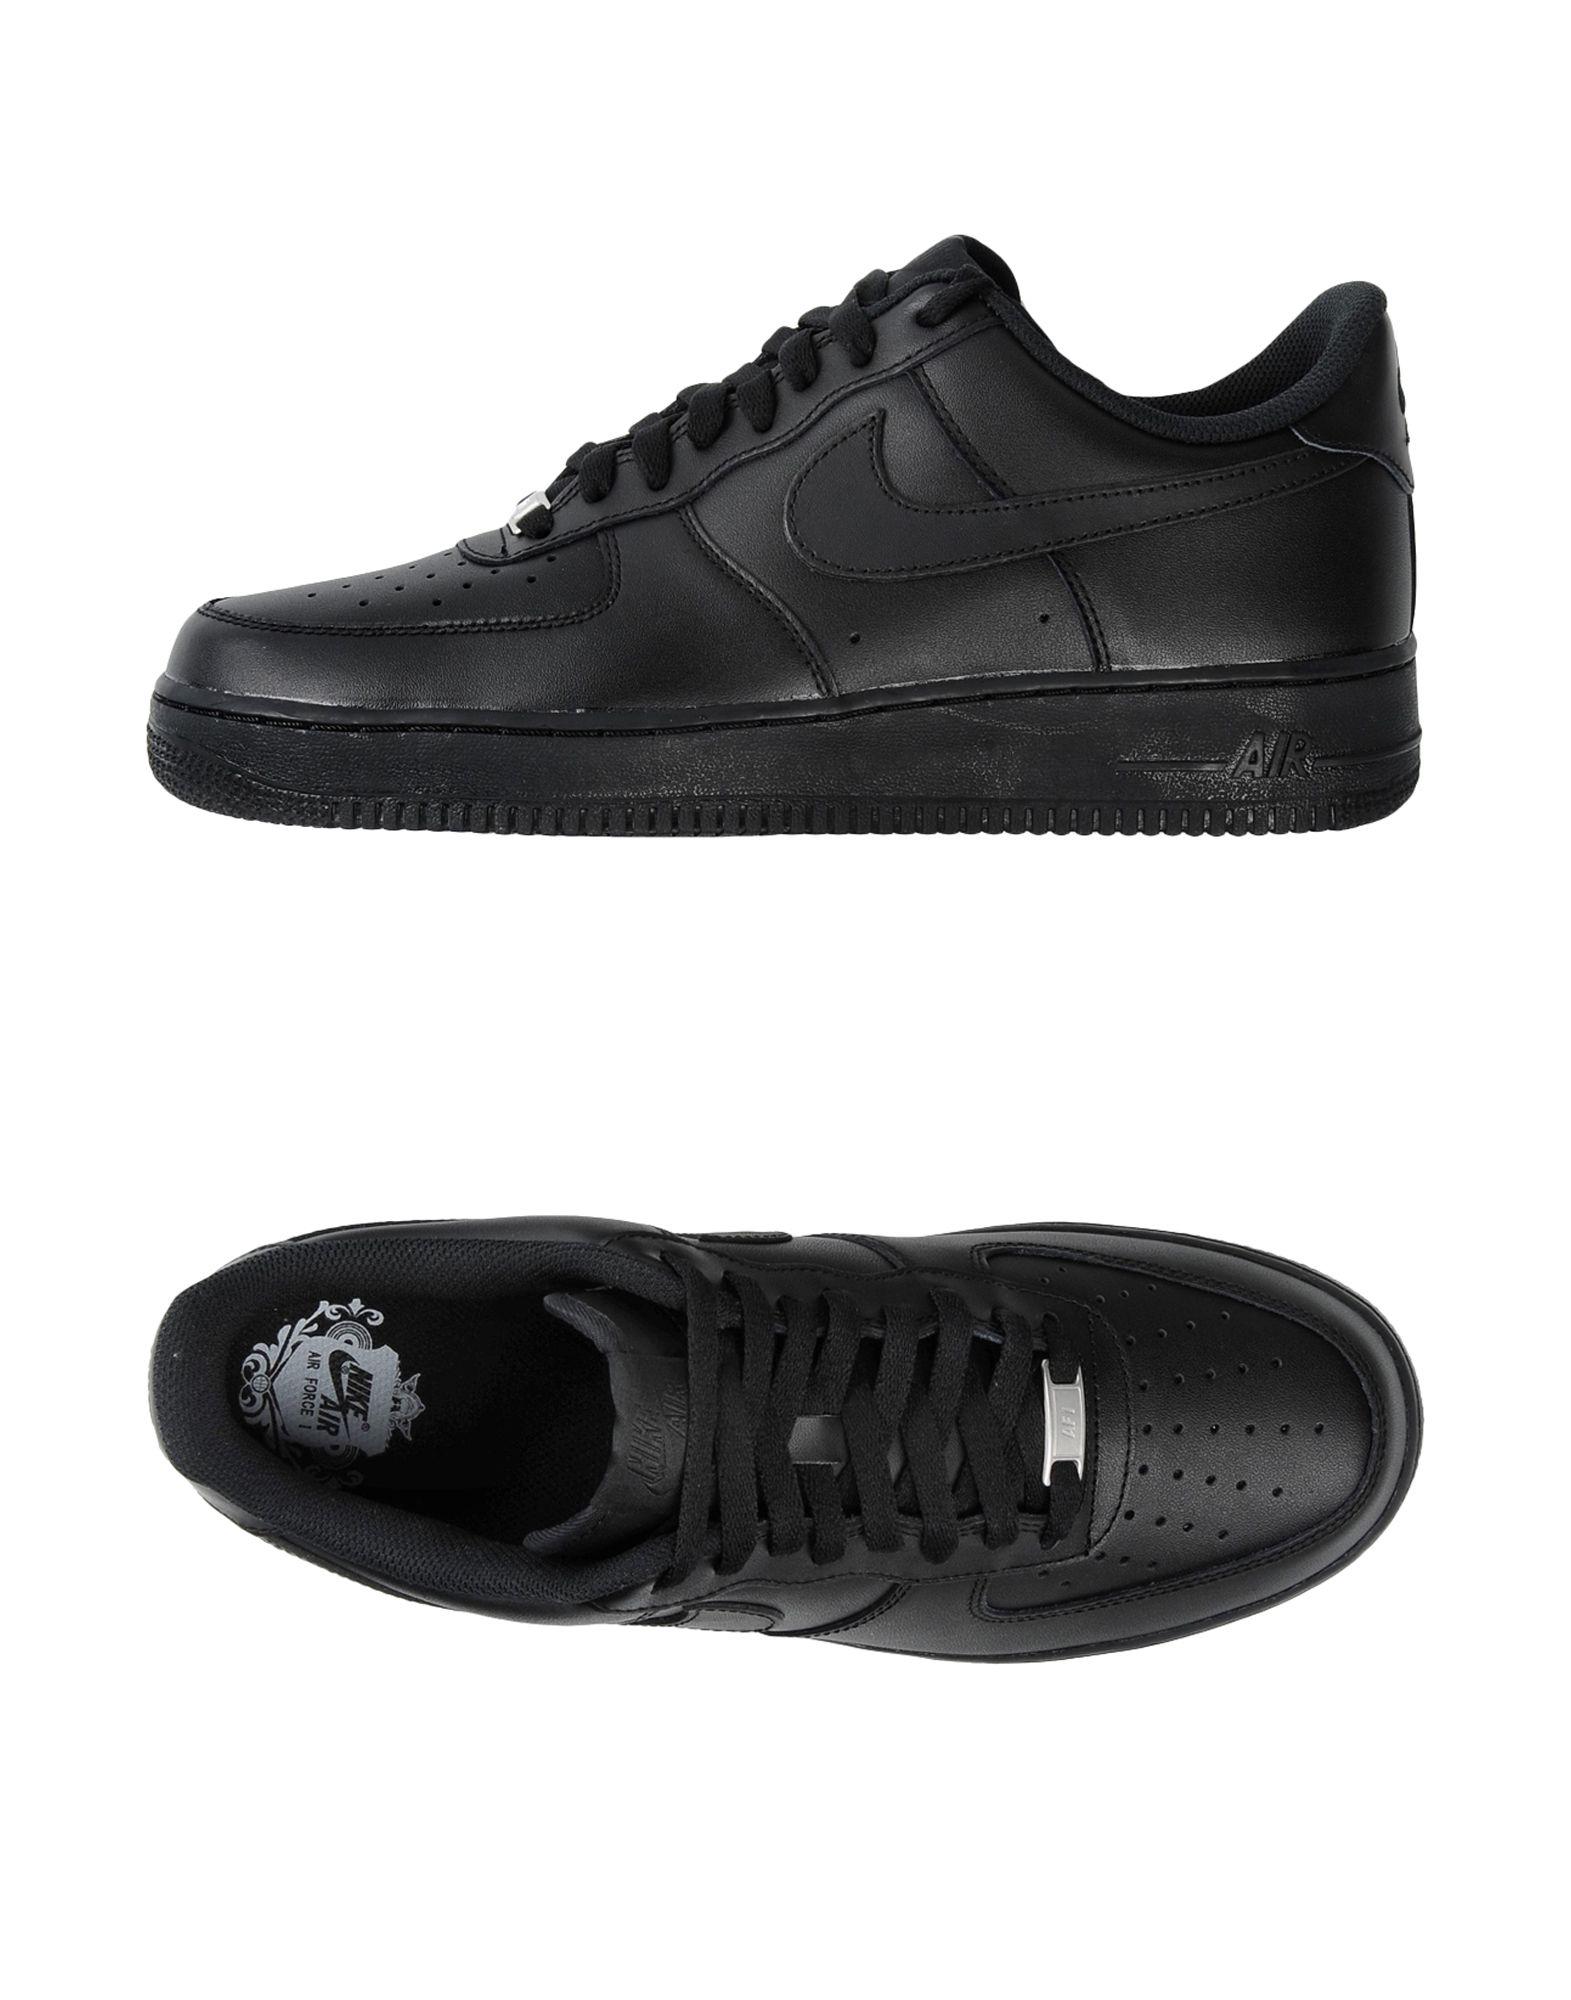 Scarpe da Ginnastica Nike Air Force 1 44744735HD 07 - Uomo - 44744735HD 1 4b0c64